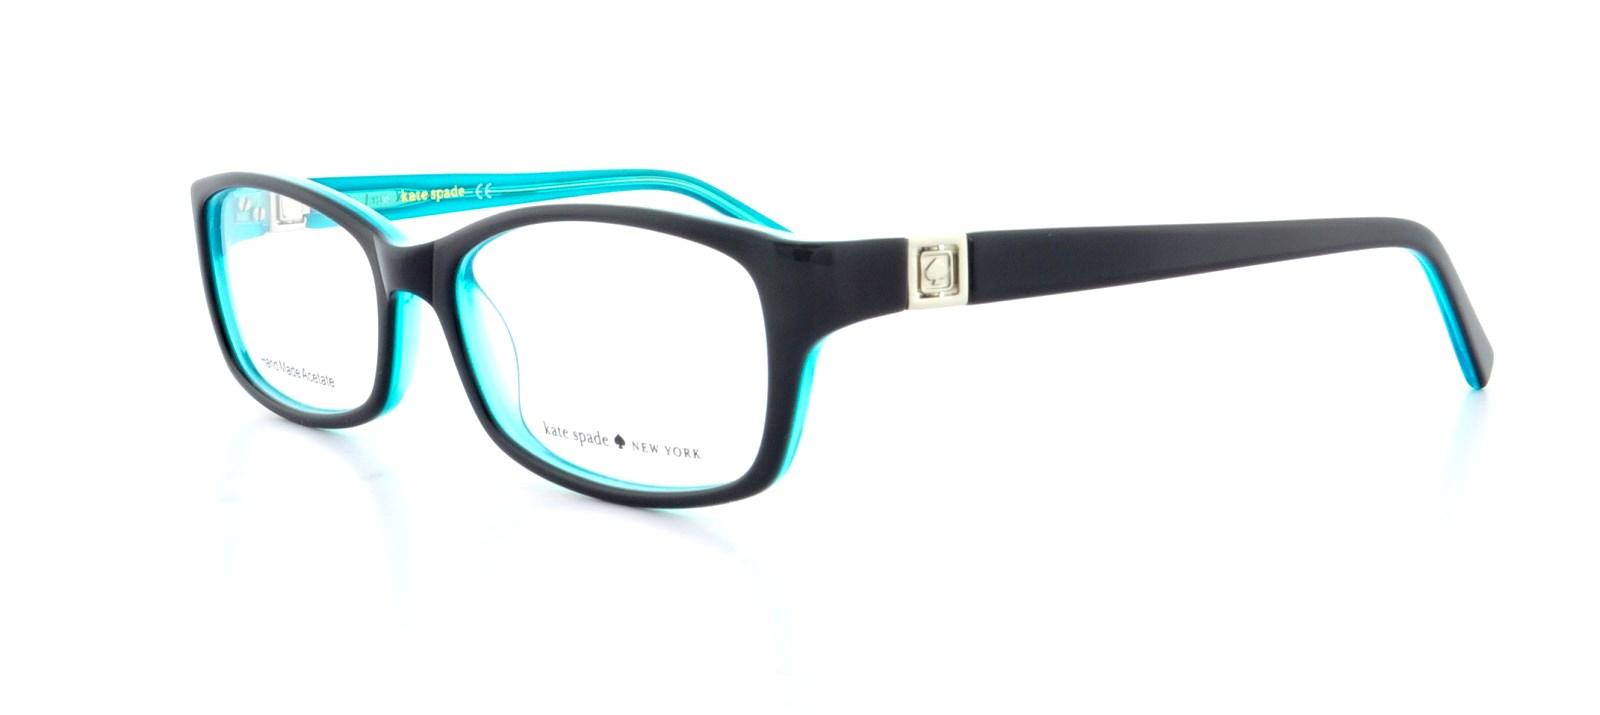 c54fe0ce39be KATE SPADE Eyeglasses REGINE 0DH4 Black Aqua 50MM | eBay